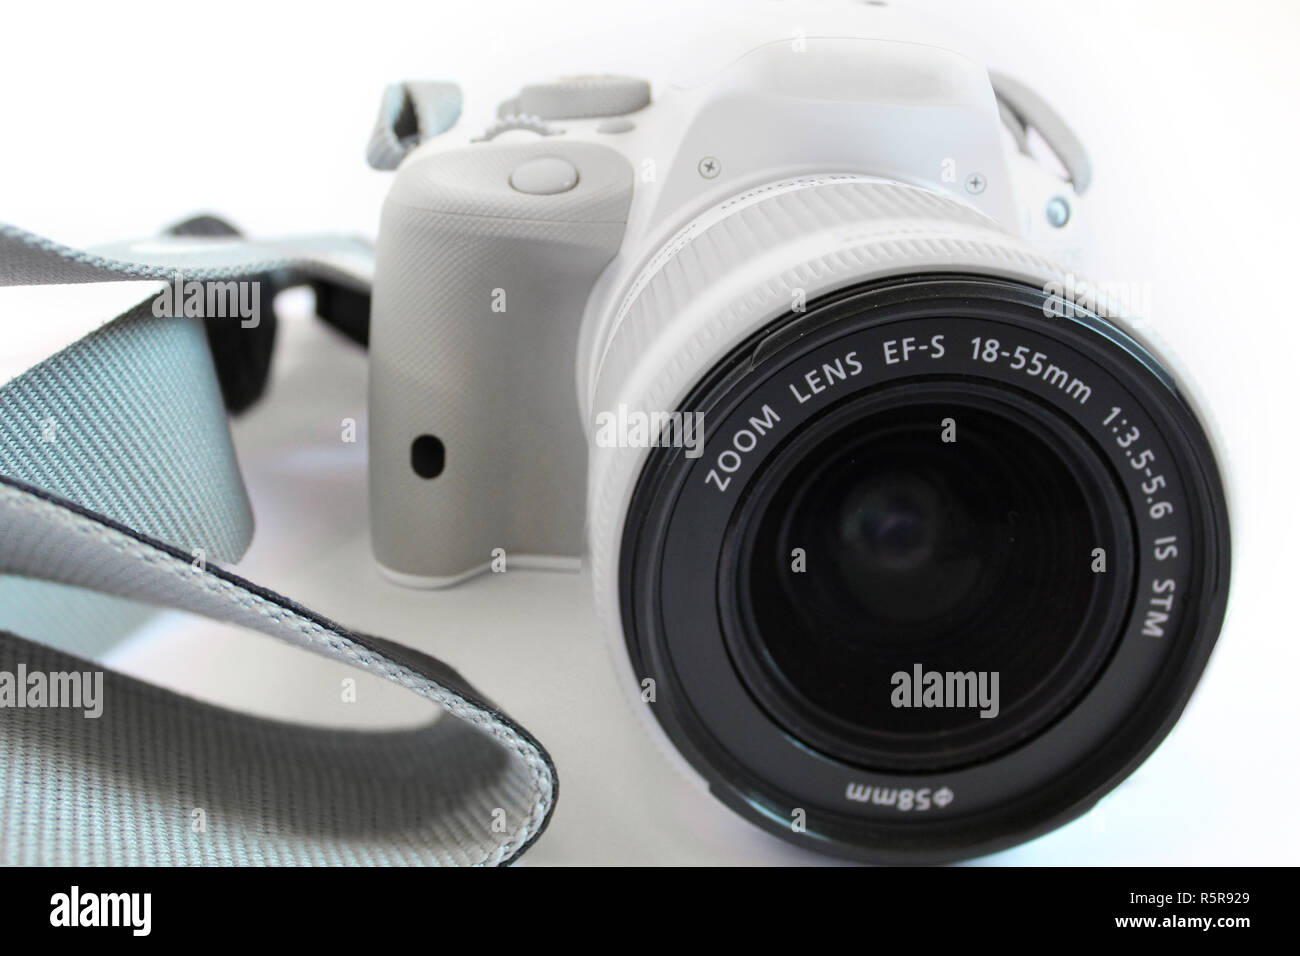 Camera digital slr single lens reflex white - Stock Image